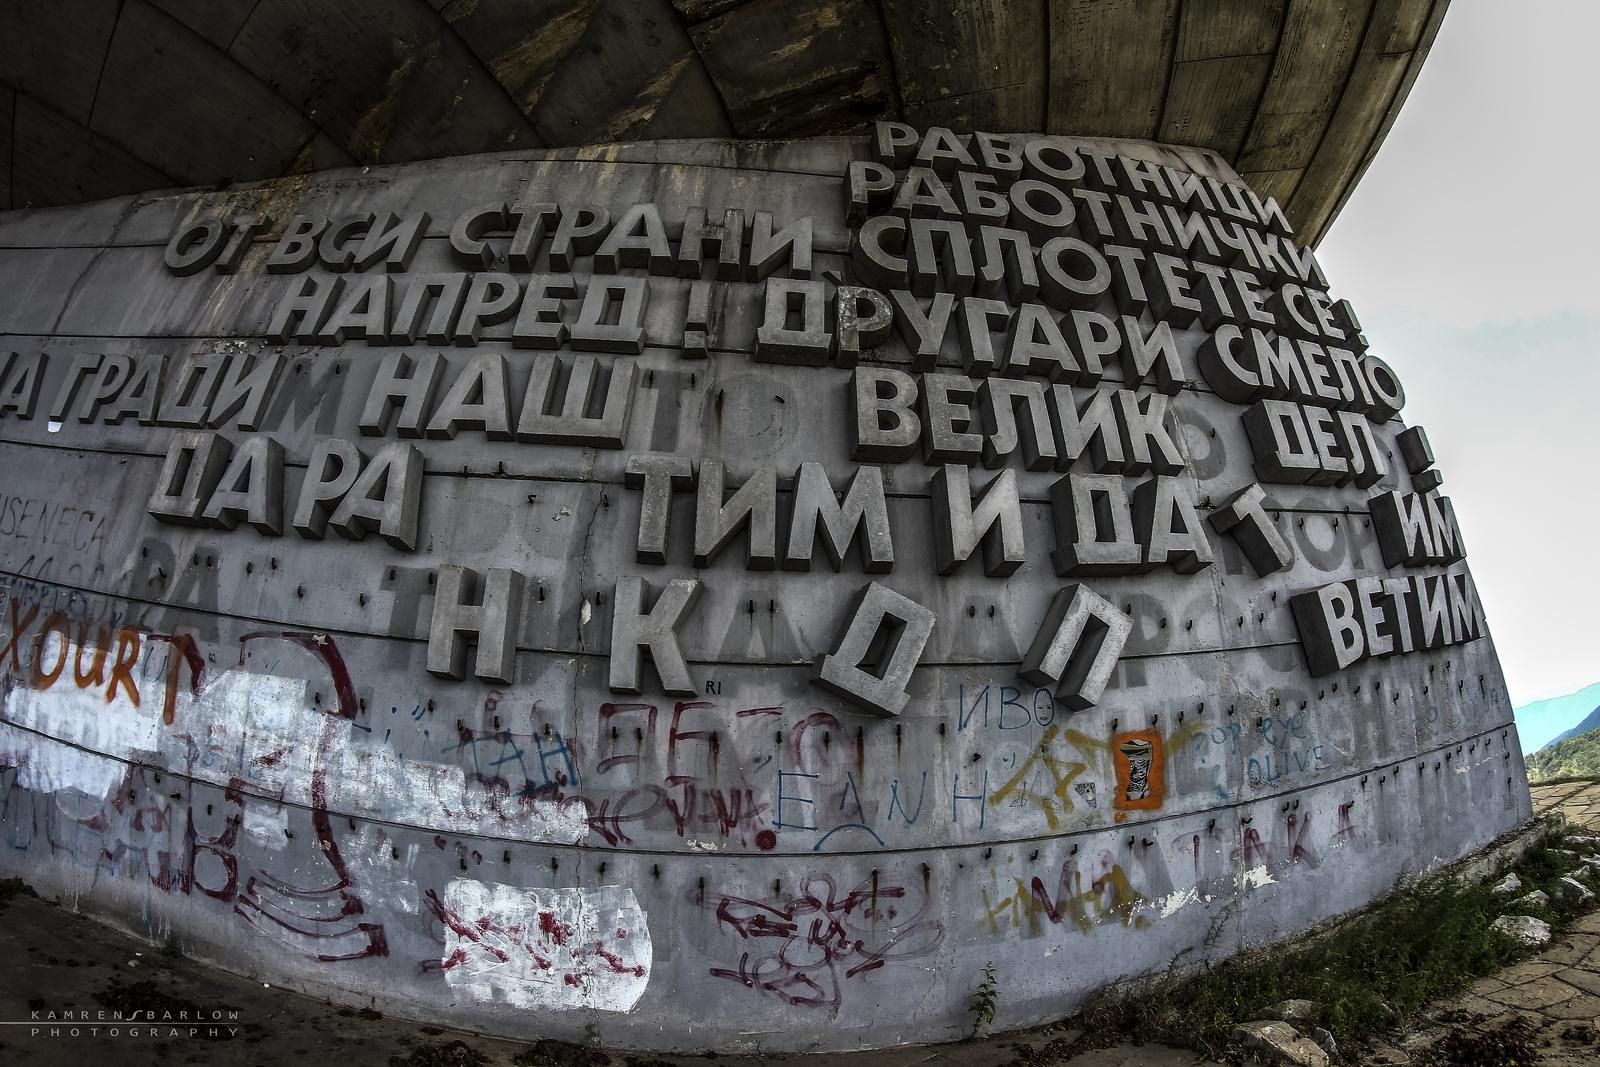 buzludzha6 Buzludzha   Forgotten Communist Monument